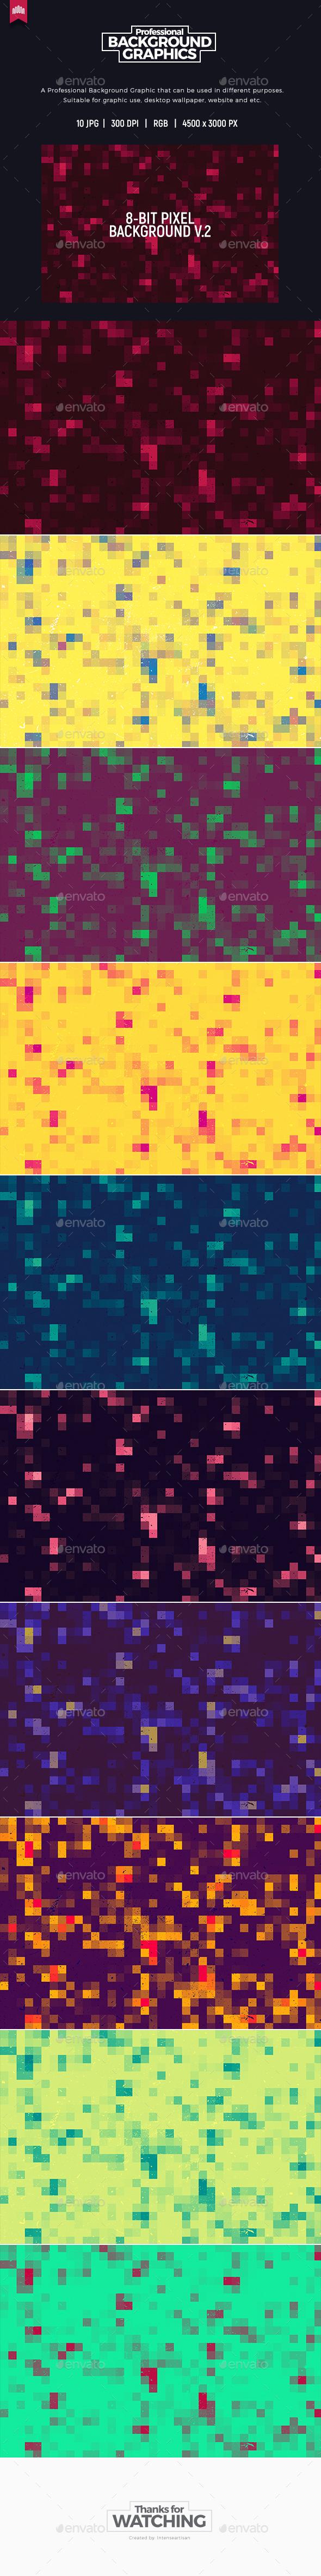 8-Bit Pixel Background V.2 - Tech / Futuristic Backgrounds